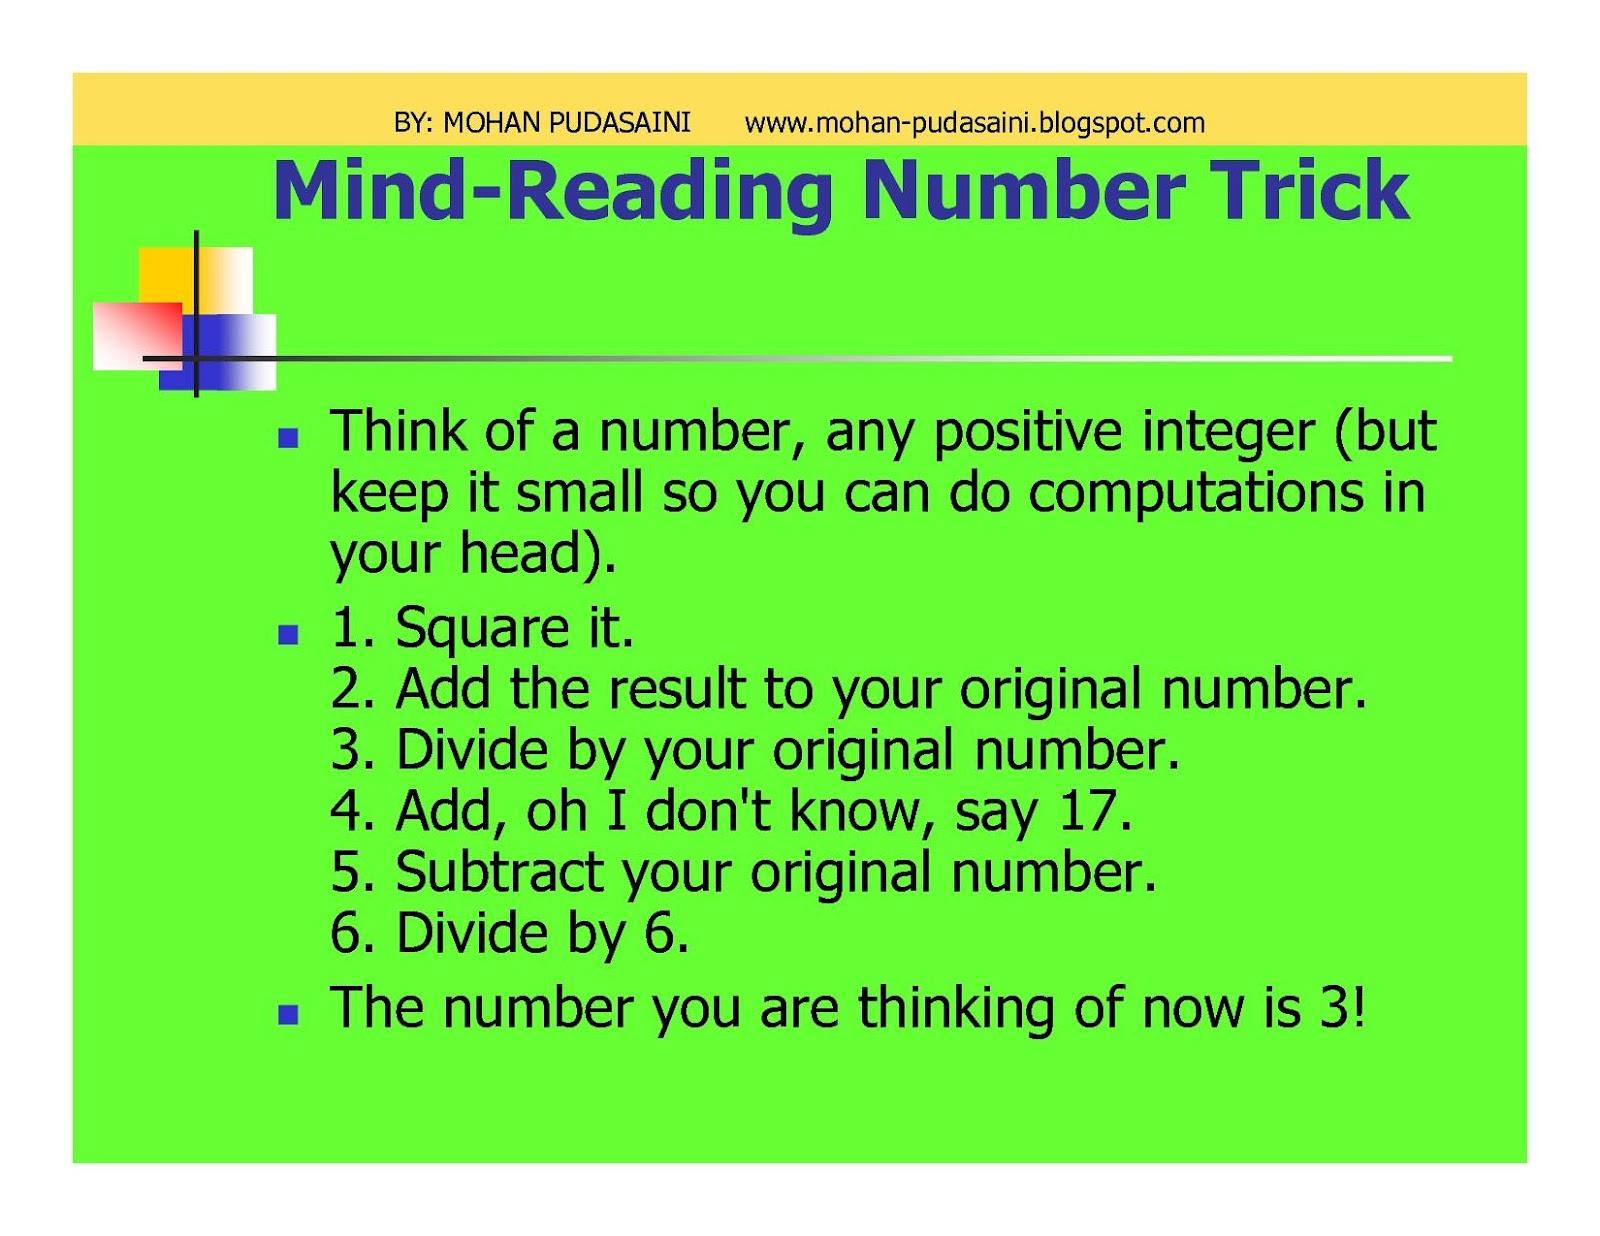 Mathe Tricks